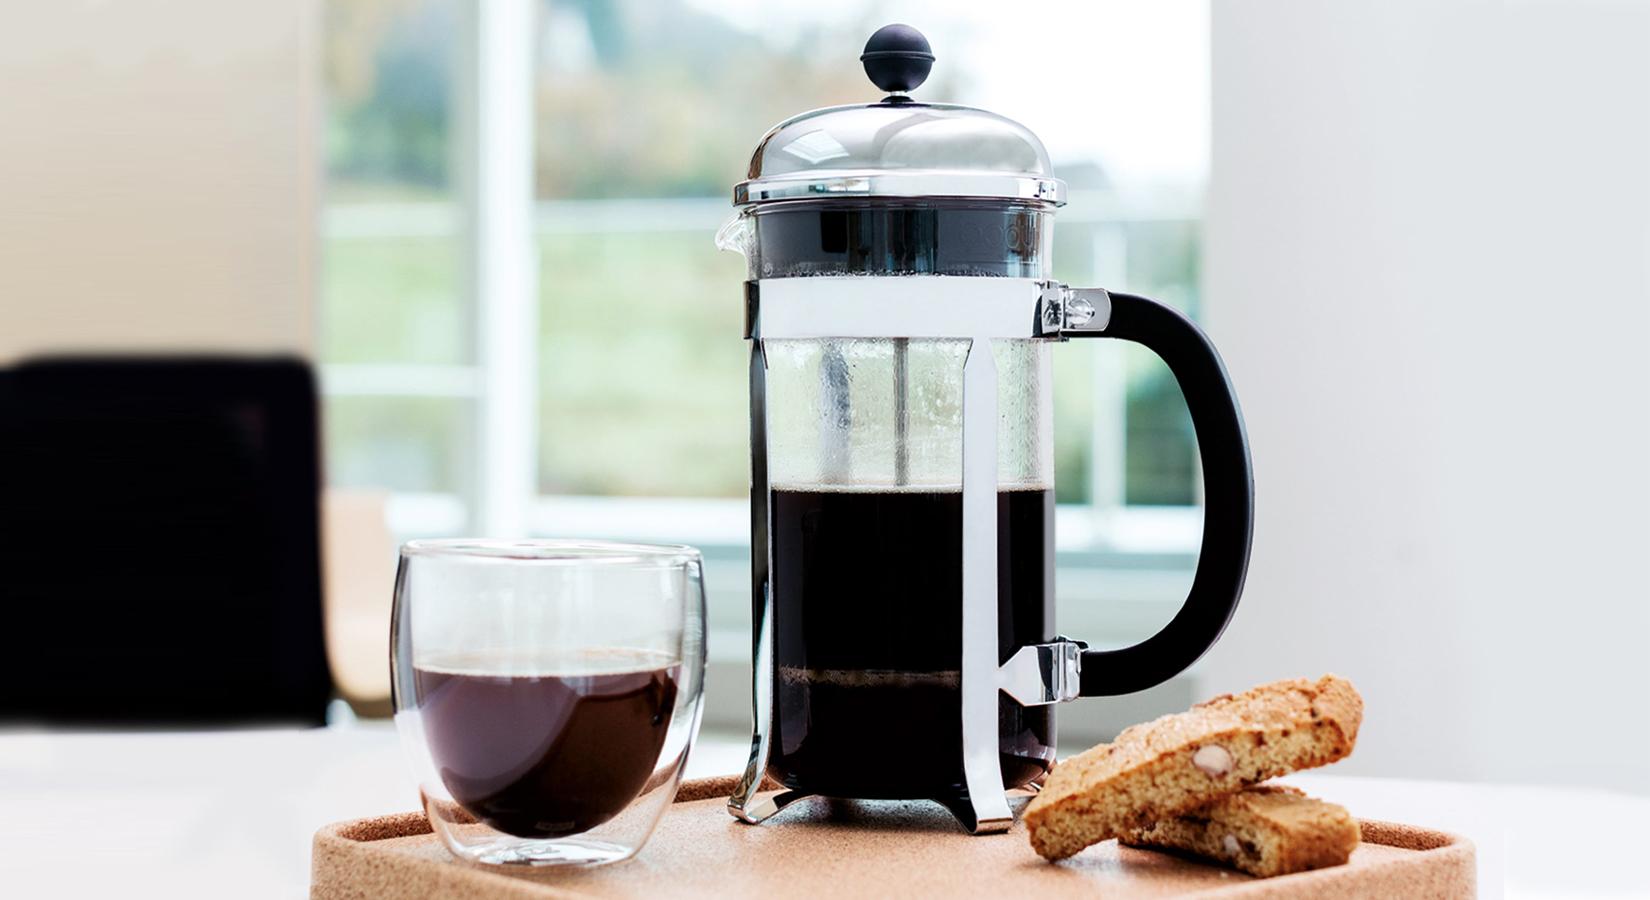 #25DaysOfGifting: Day 11 – Modena Coffee Press & Glass Set